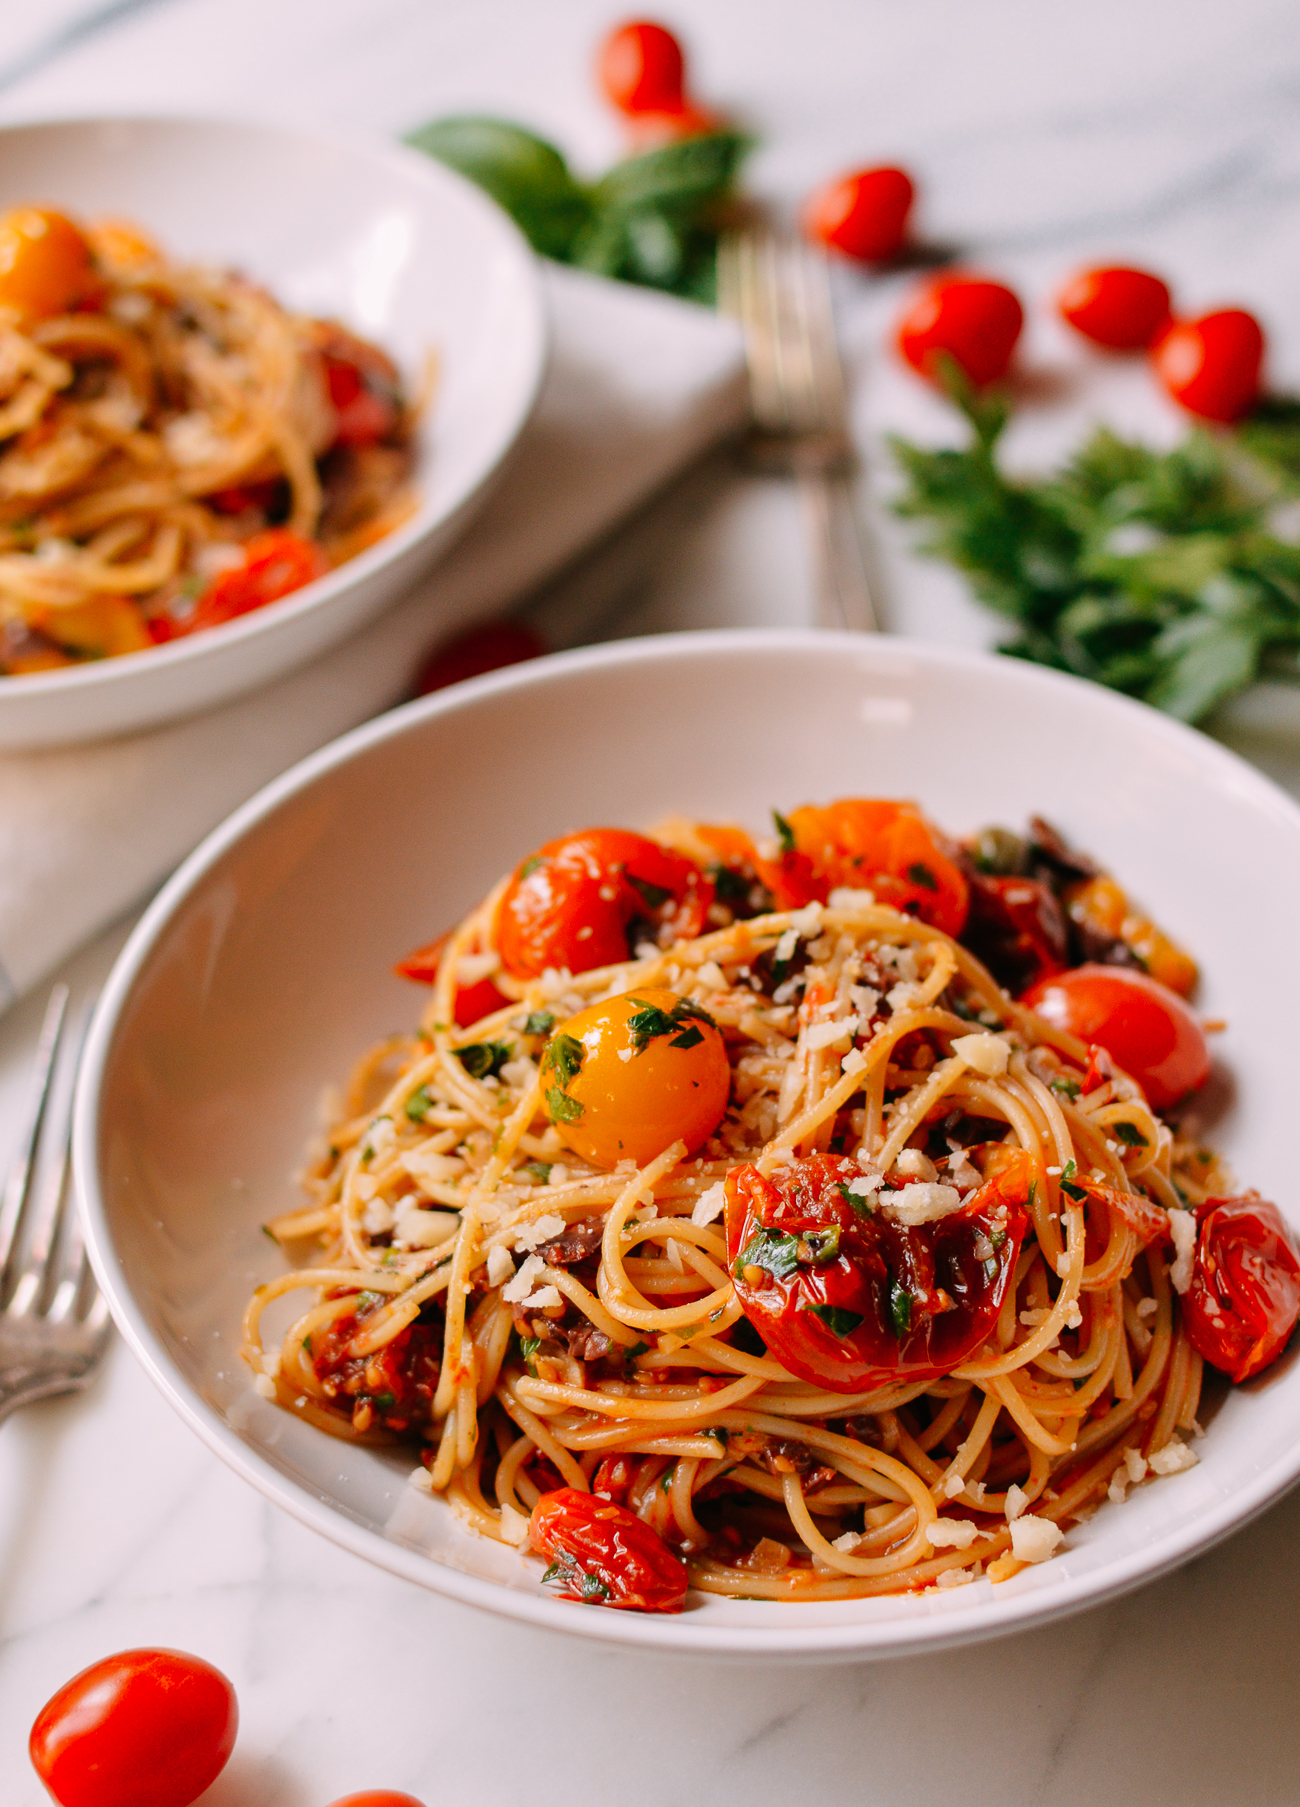 Bowl of Roasted Tomato Spaghetti Puttanesca